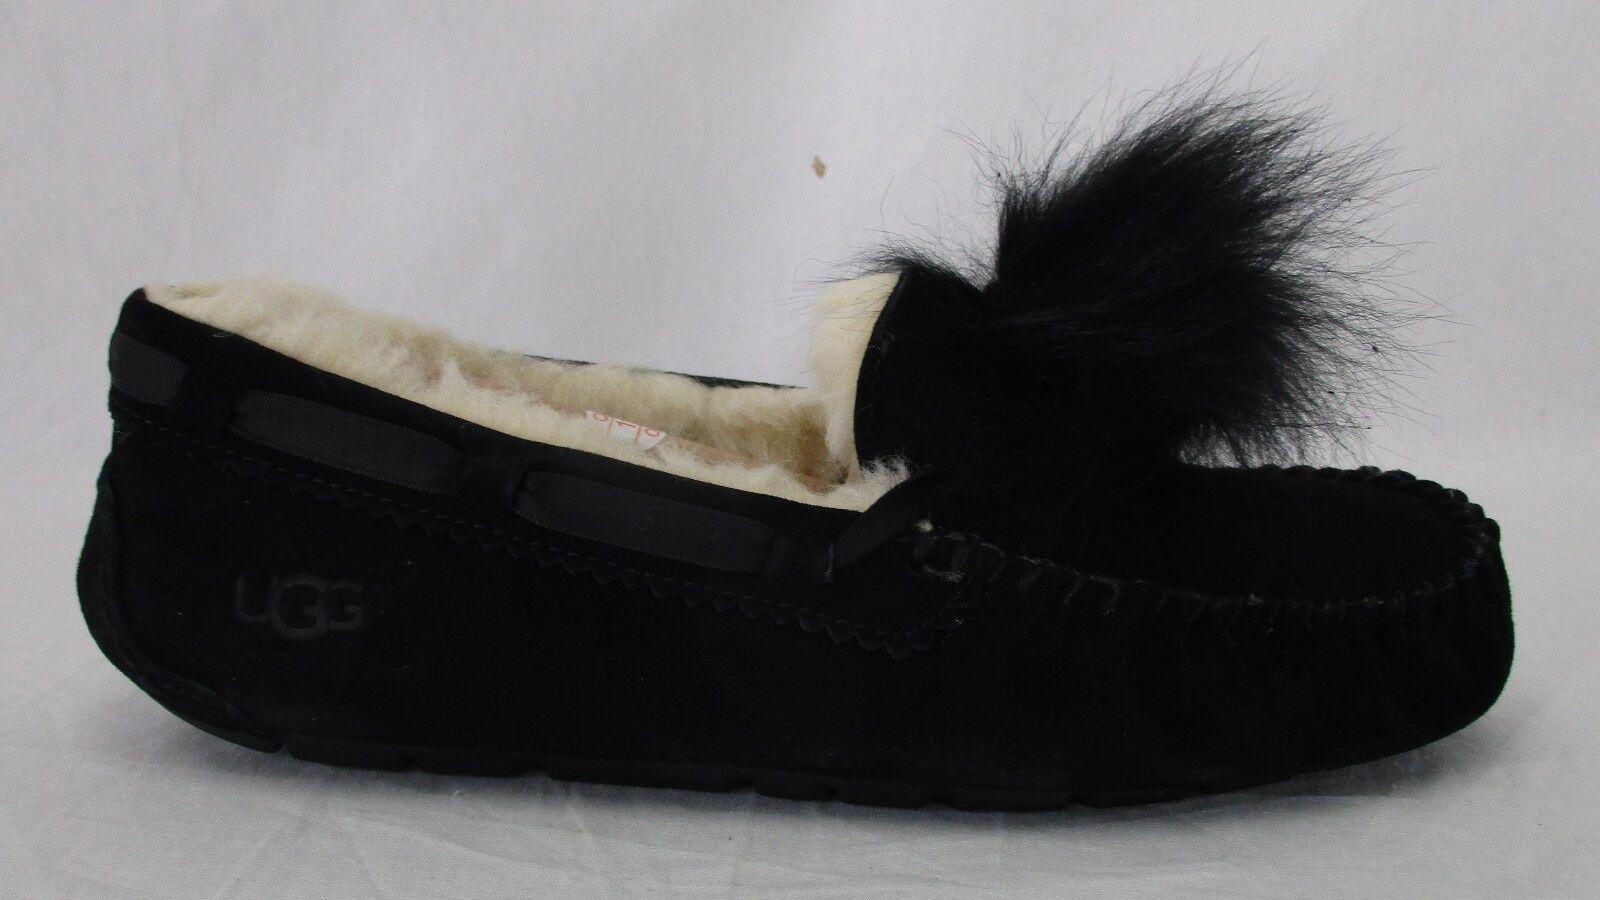 Pantoufles Dakota Pom Pom pour femmes UGG 1019015 Noir Taille 8